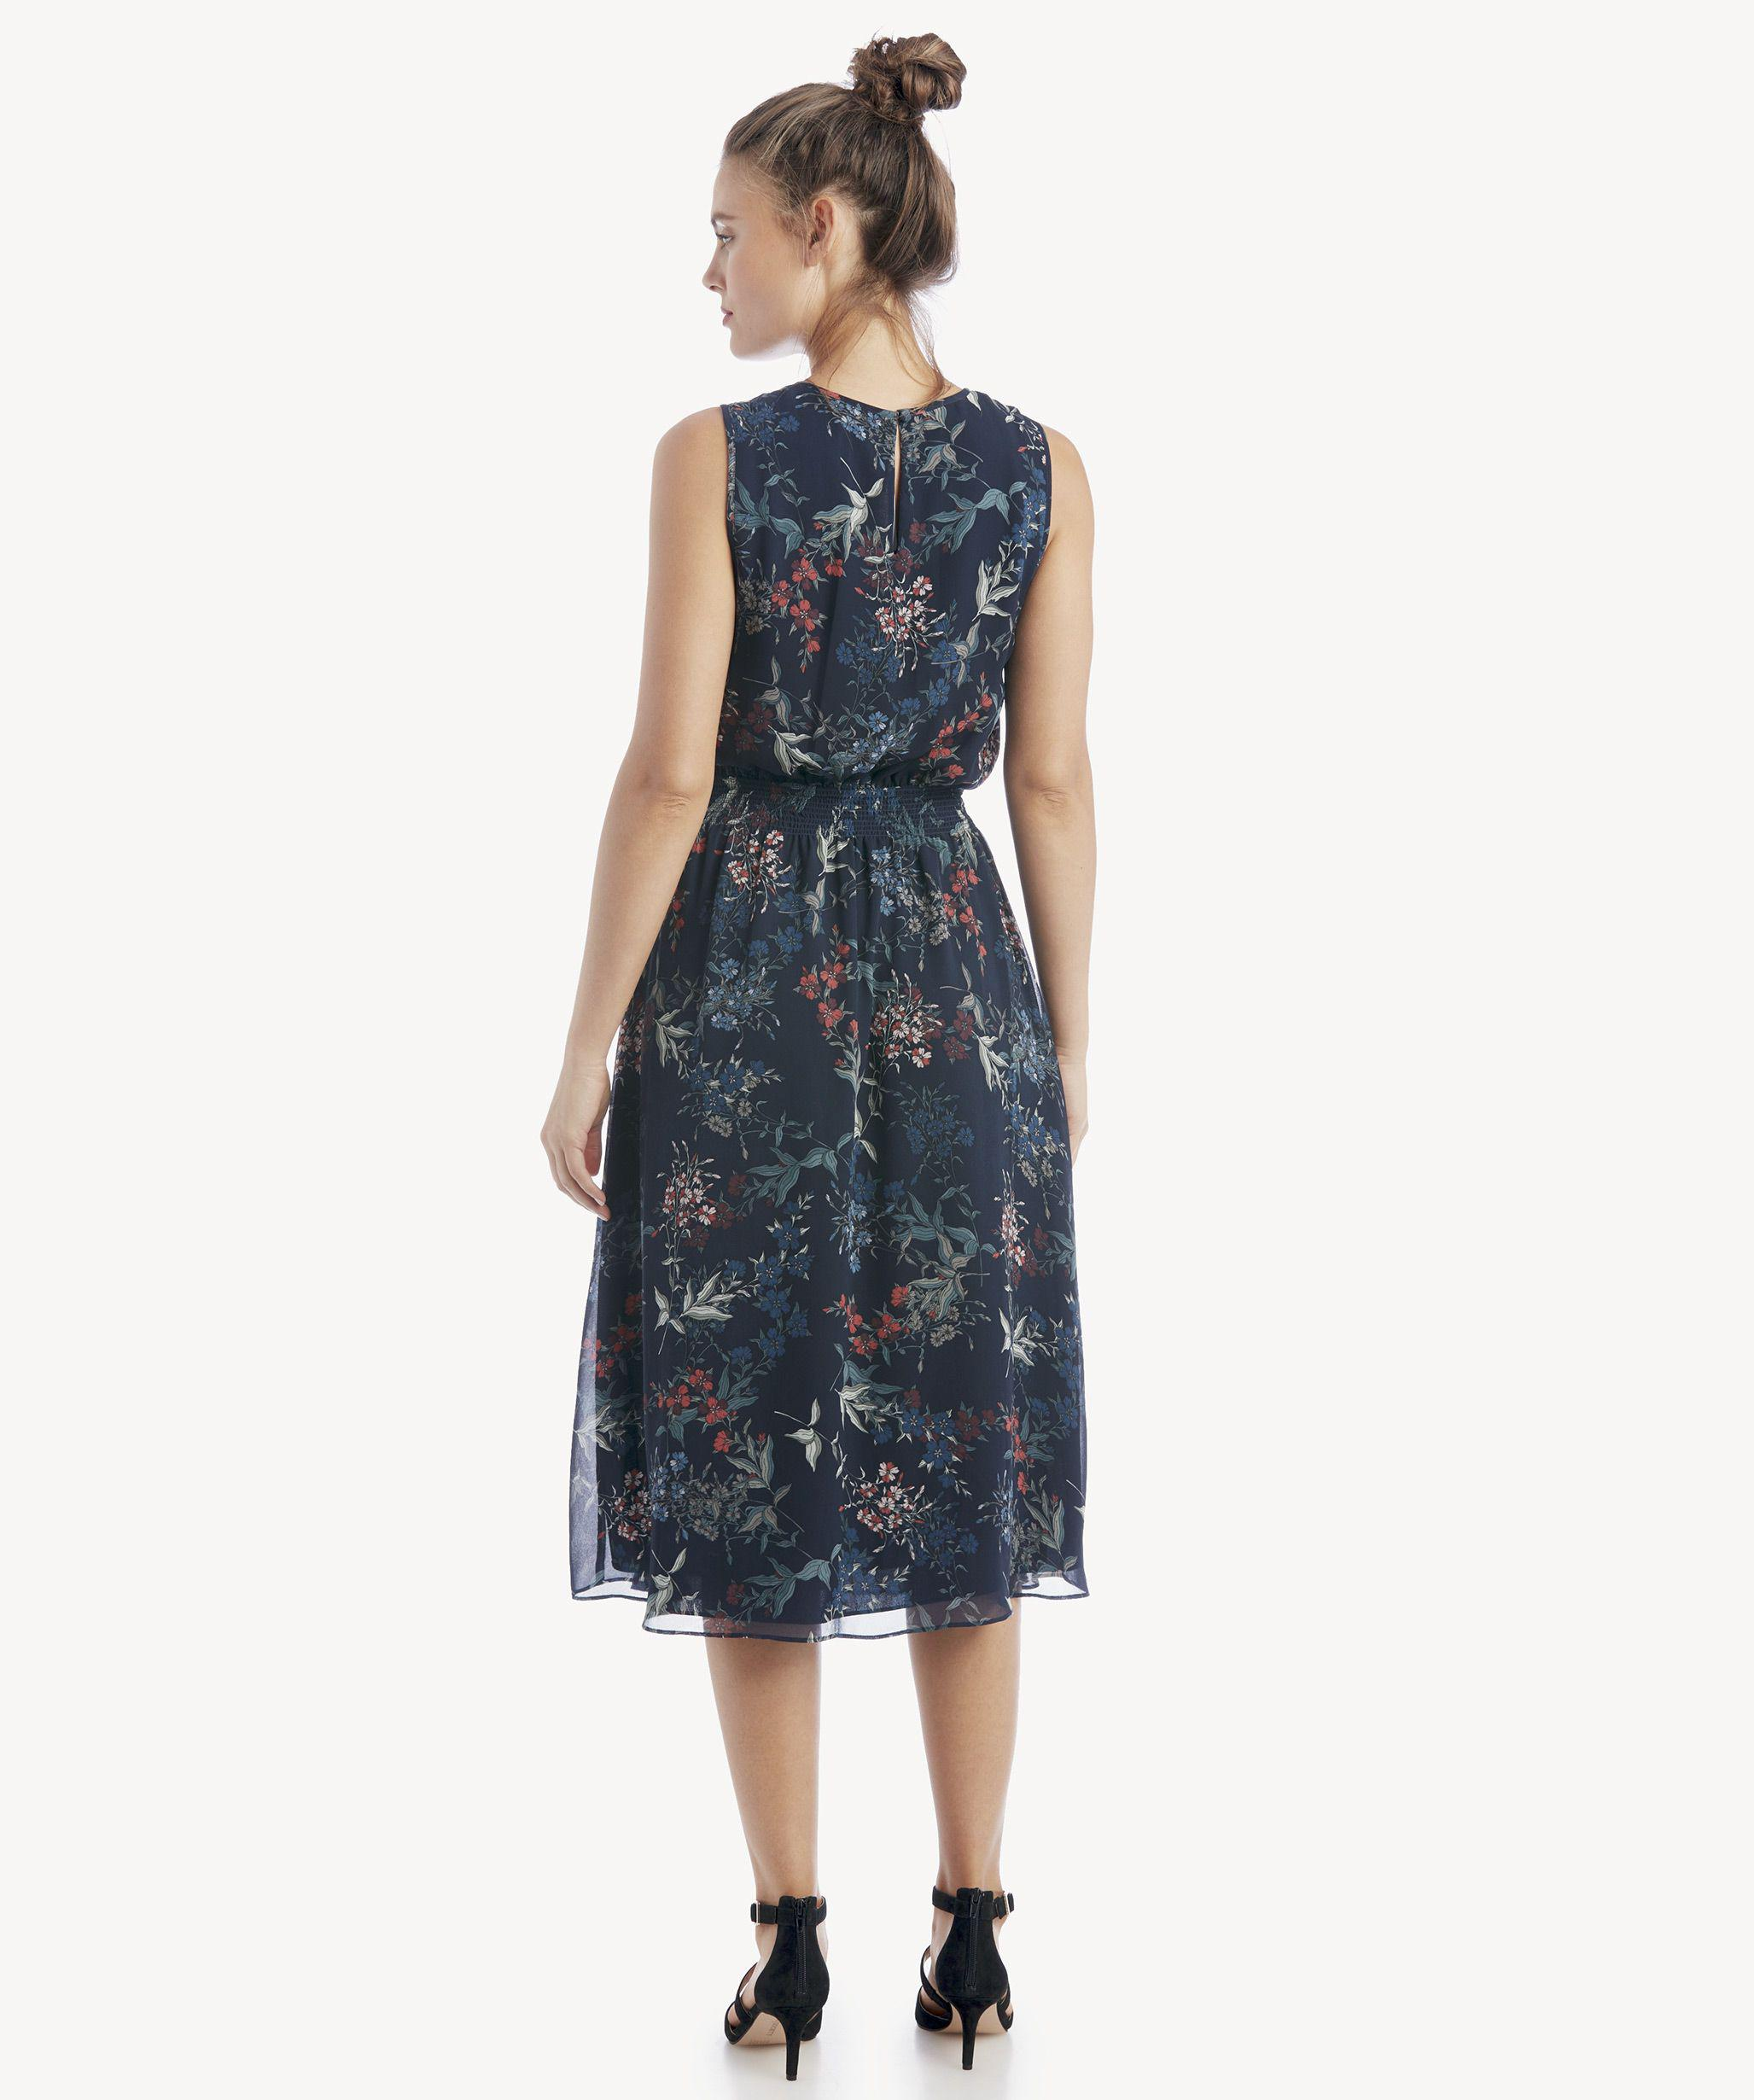 233c379a4d7 Vince Camuto - Blue S l Smocked Waist Garden Floral Dress - Lyst. View  fullscreen